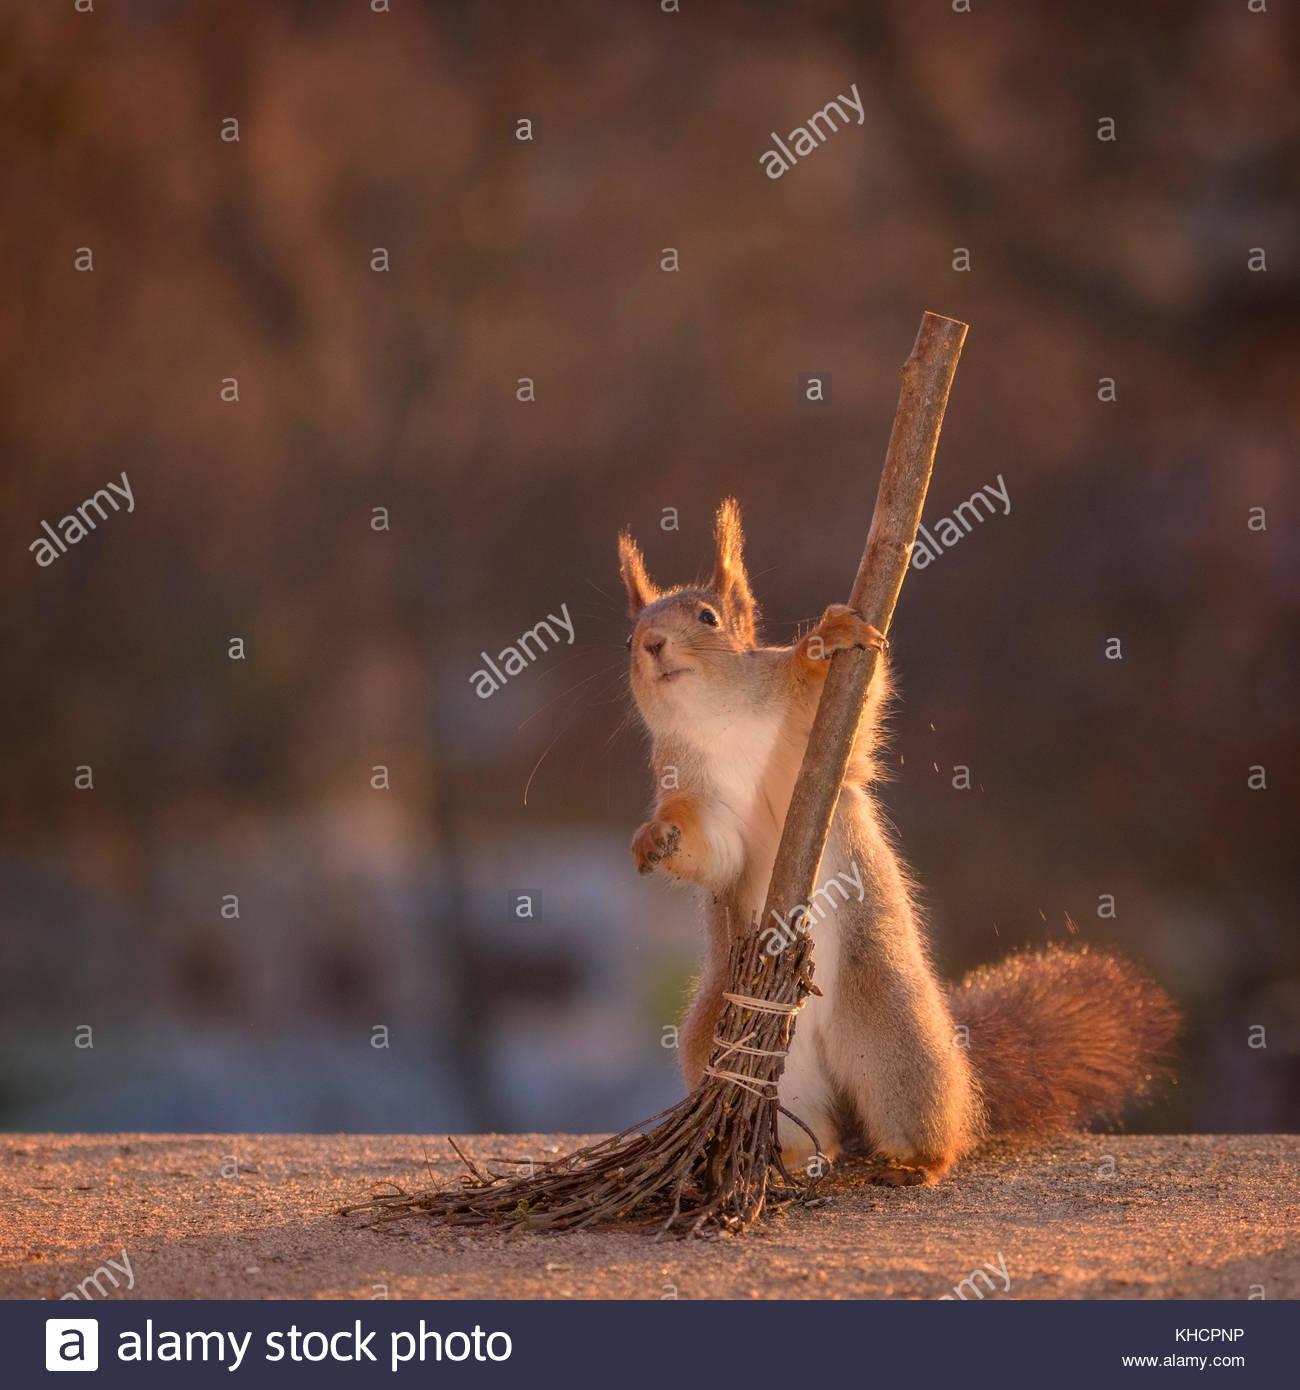 L'écureuil roux est Holding on to a broom Photo Stock